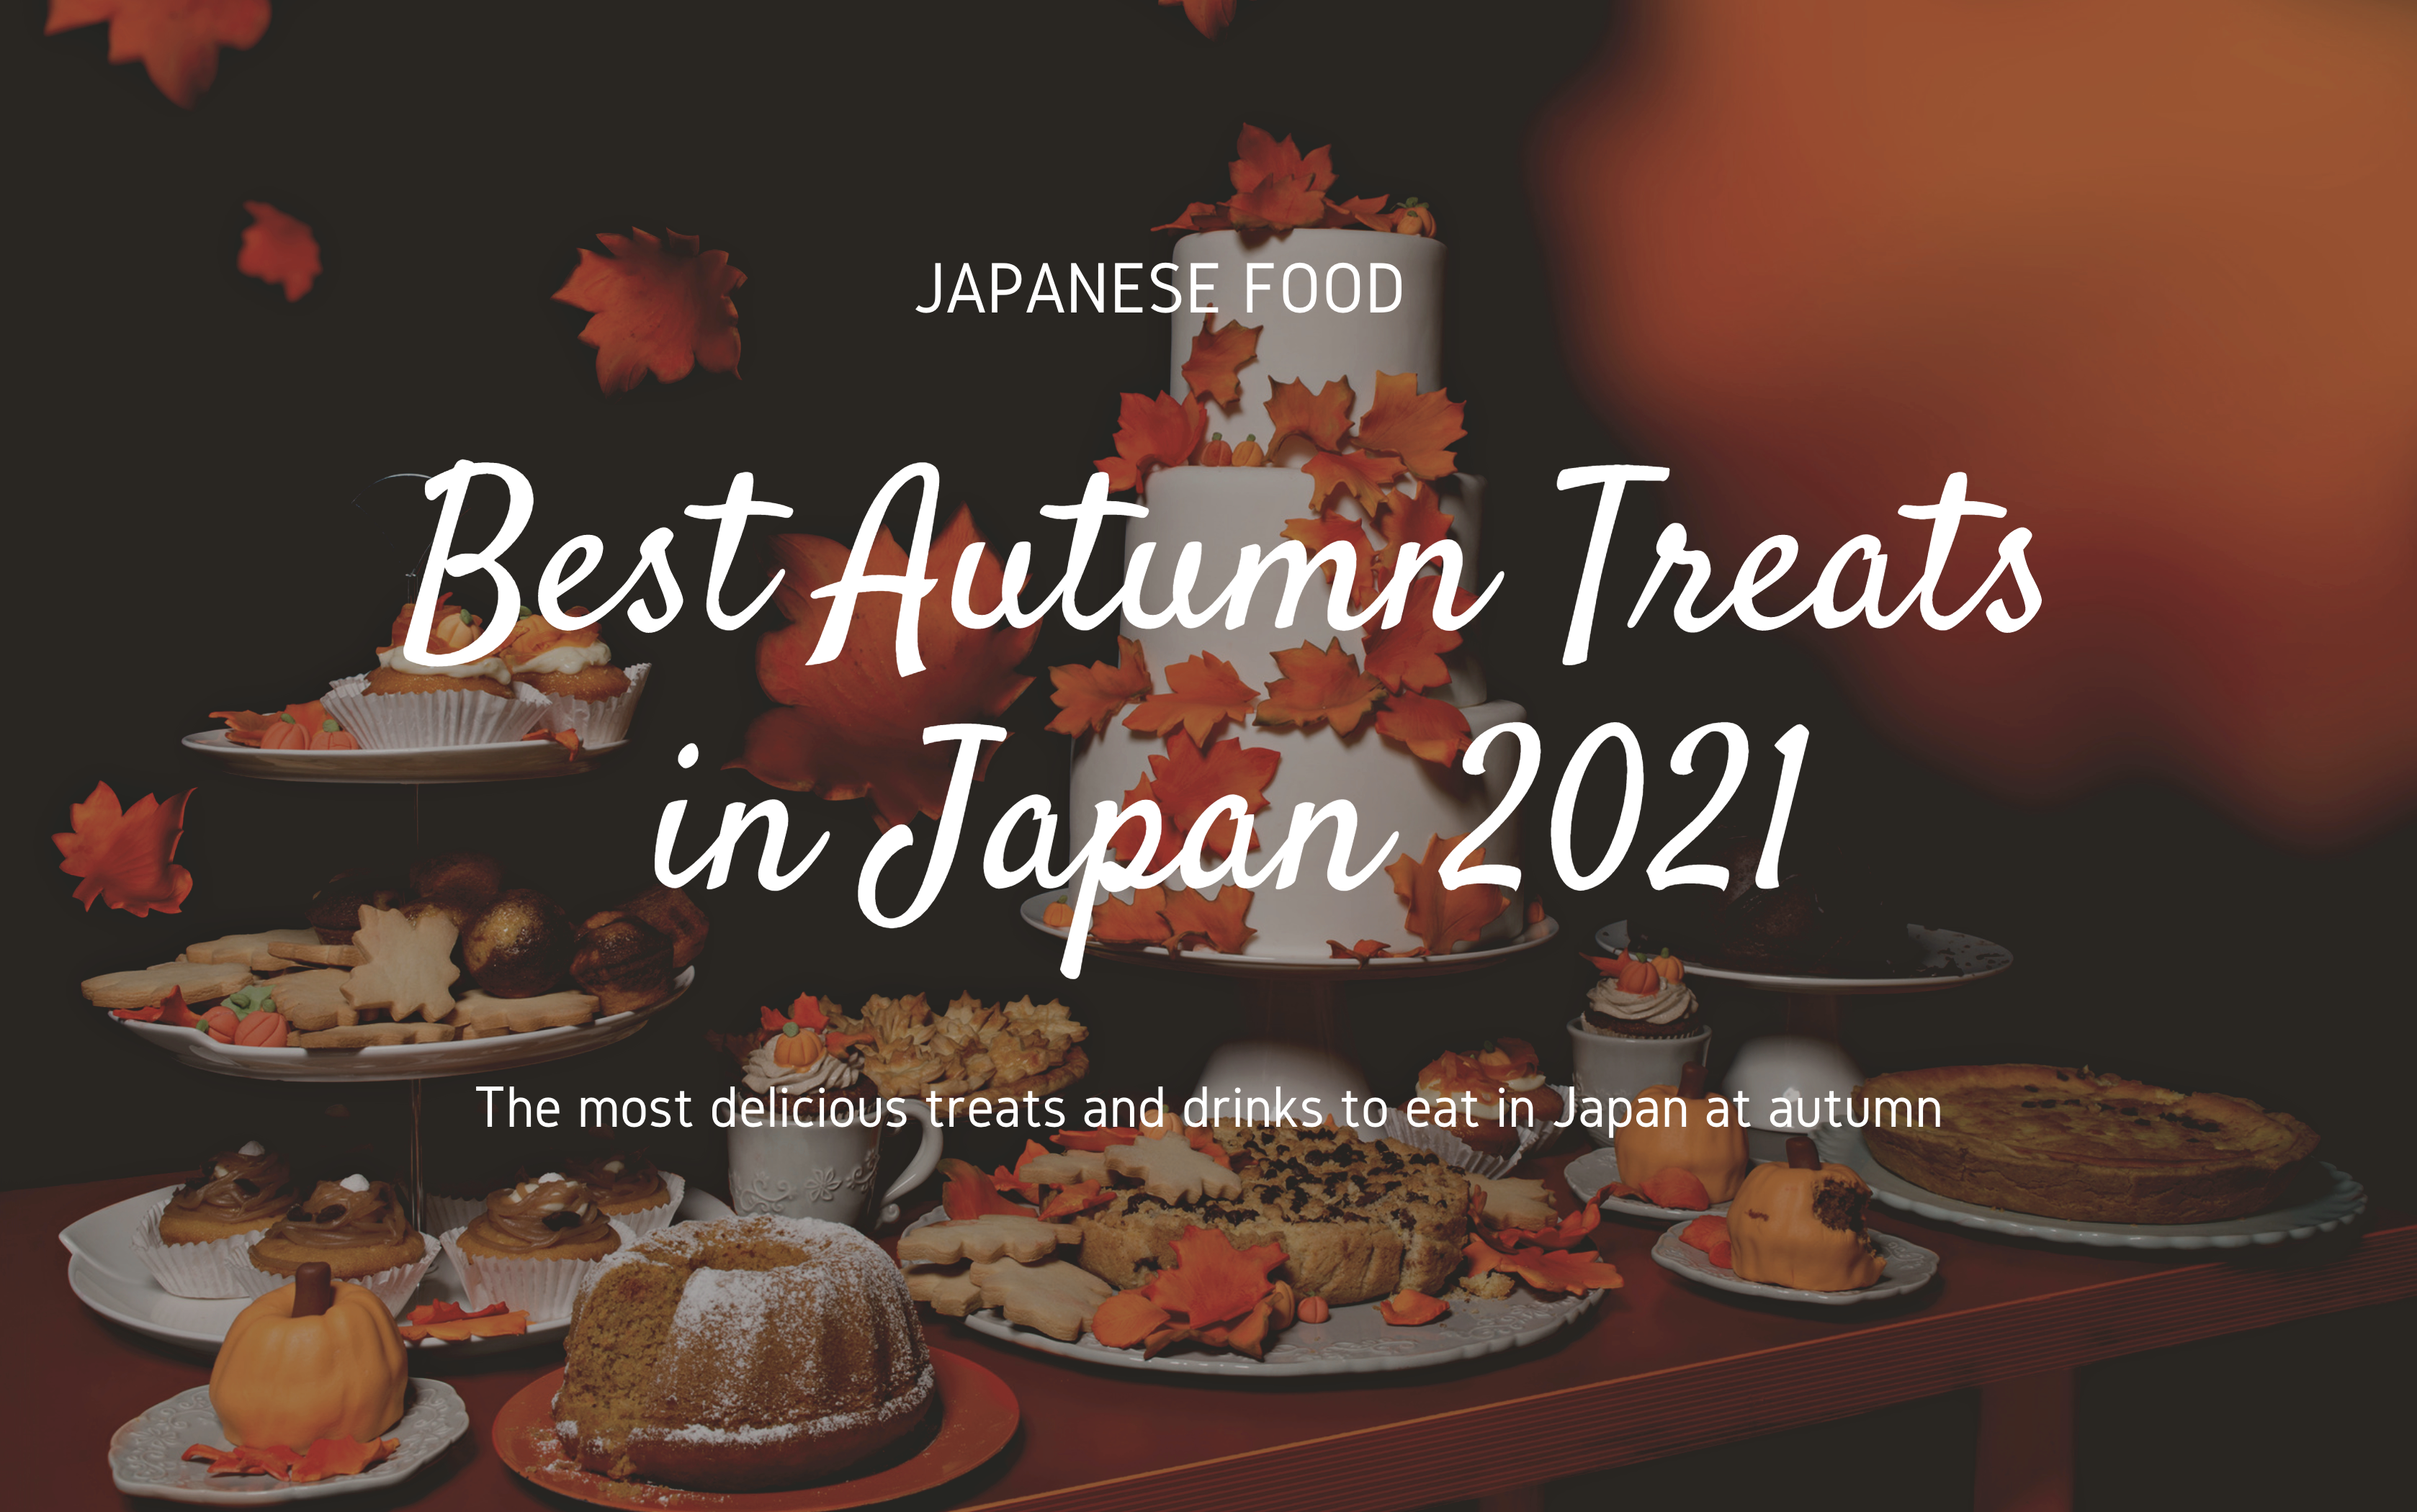 Best Autumn Treats in Japan 2021